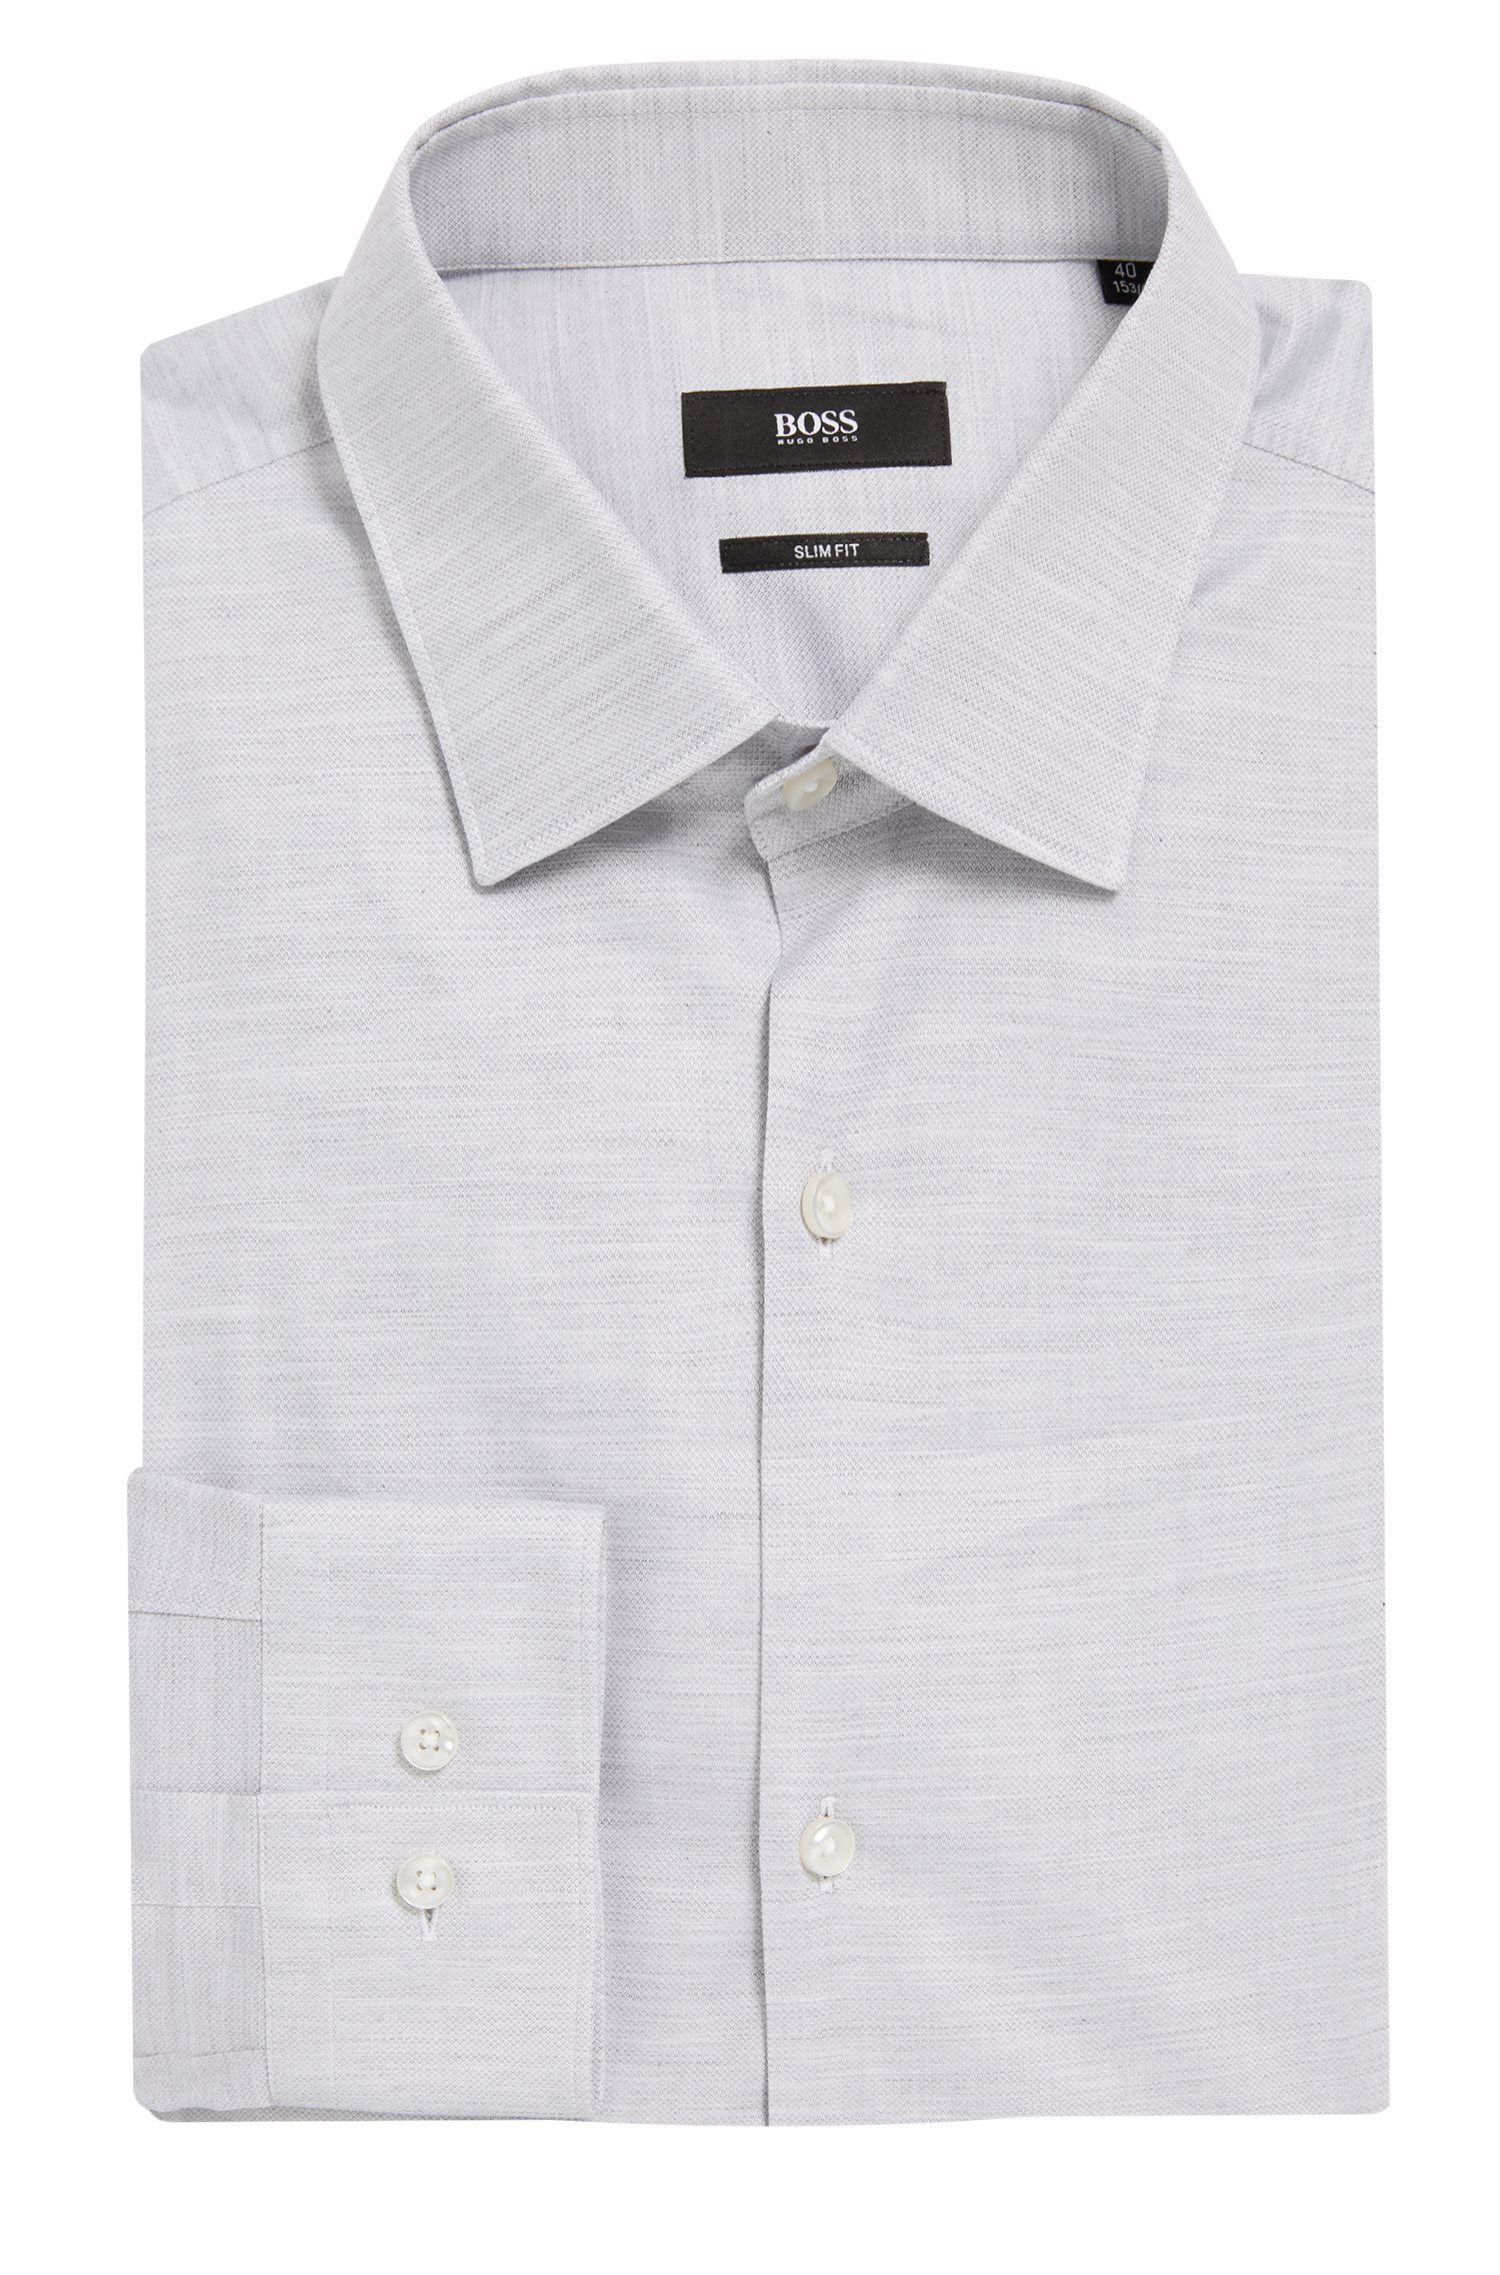 'Ismo' | Slim fit, Heathered Oxford Cotton Dress Shirt